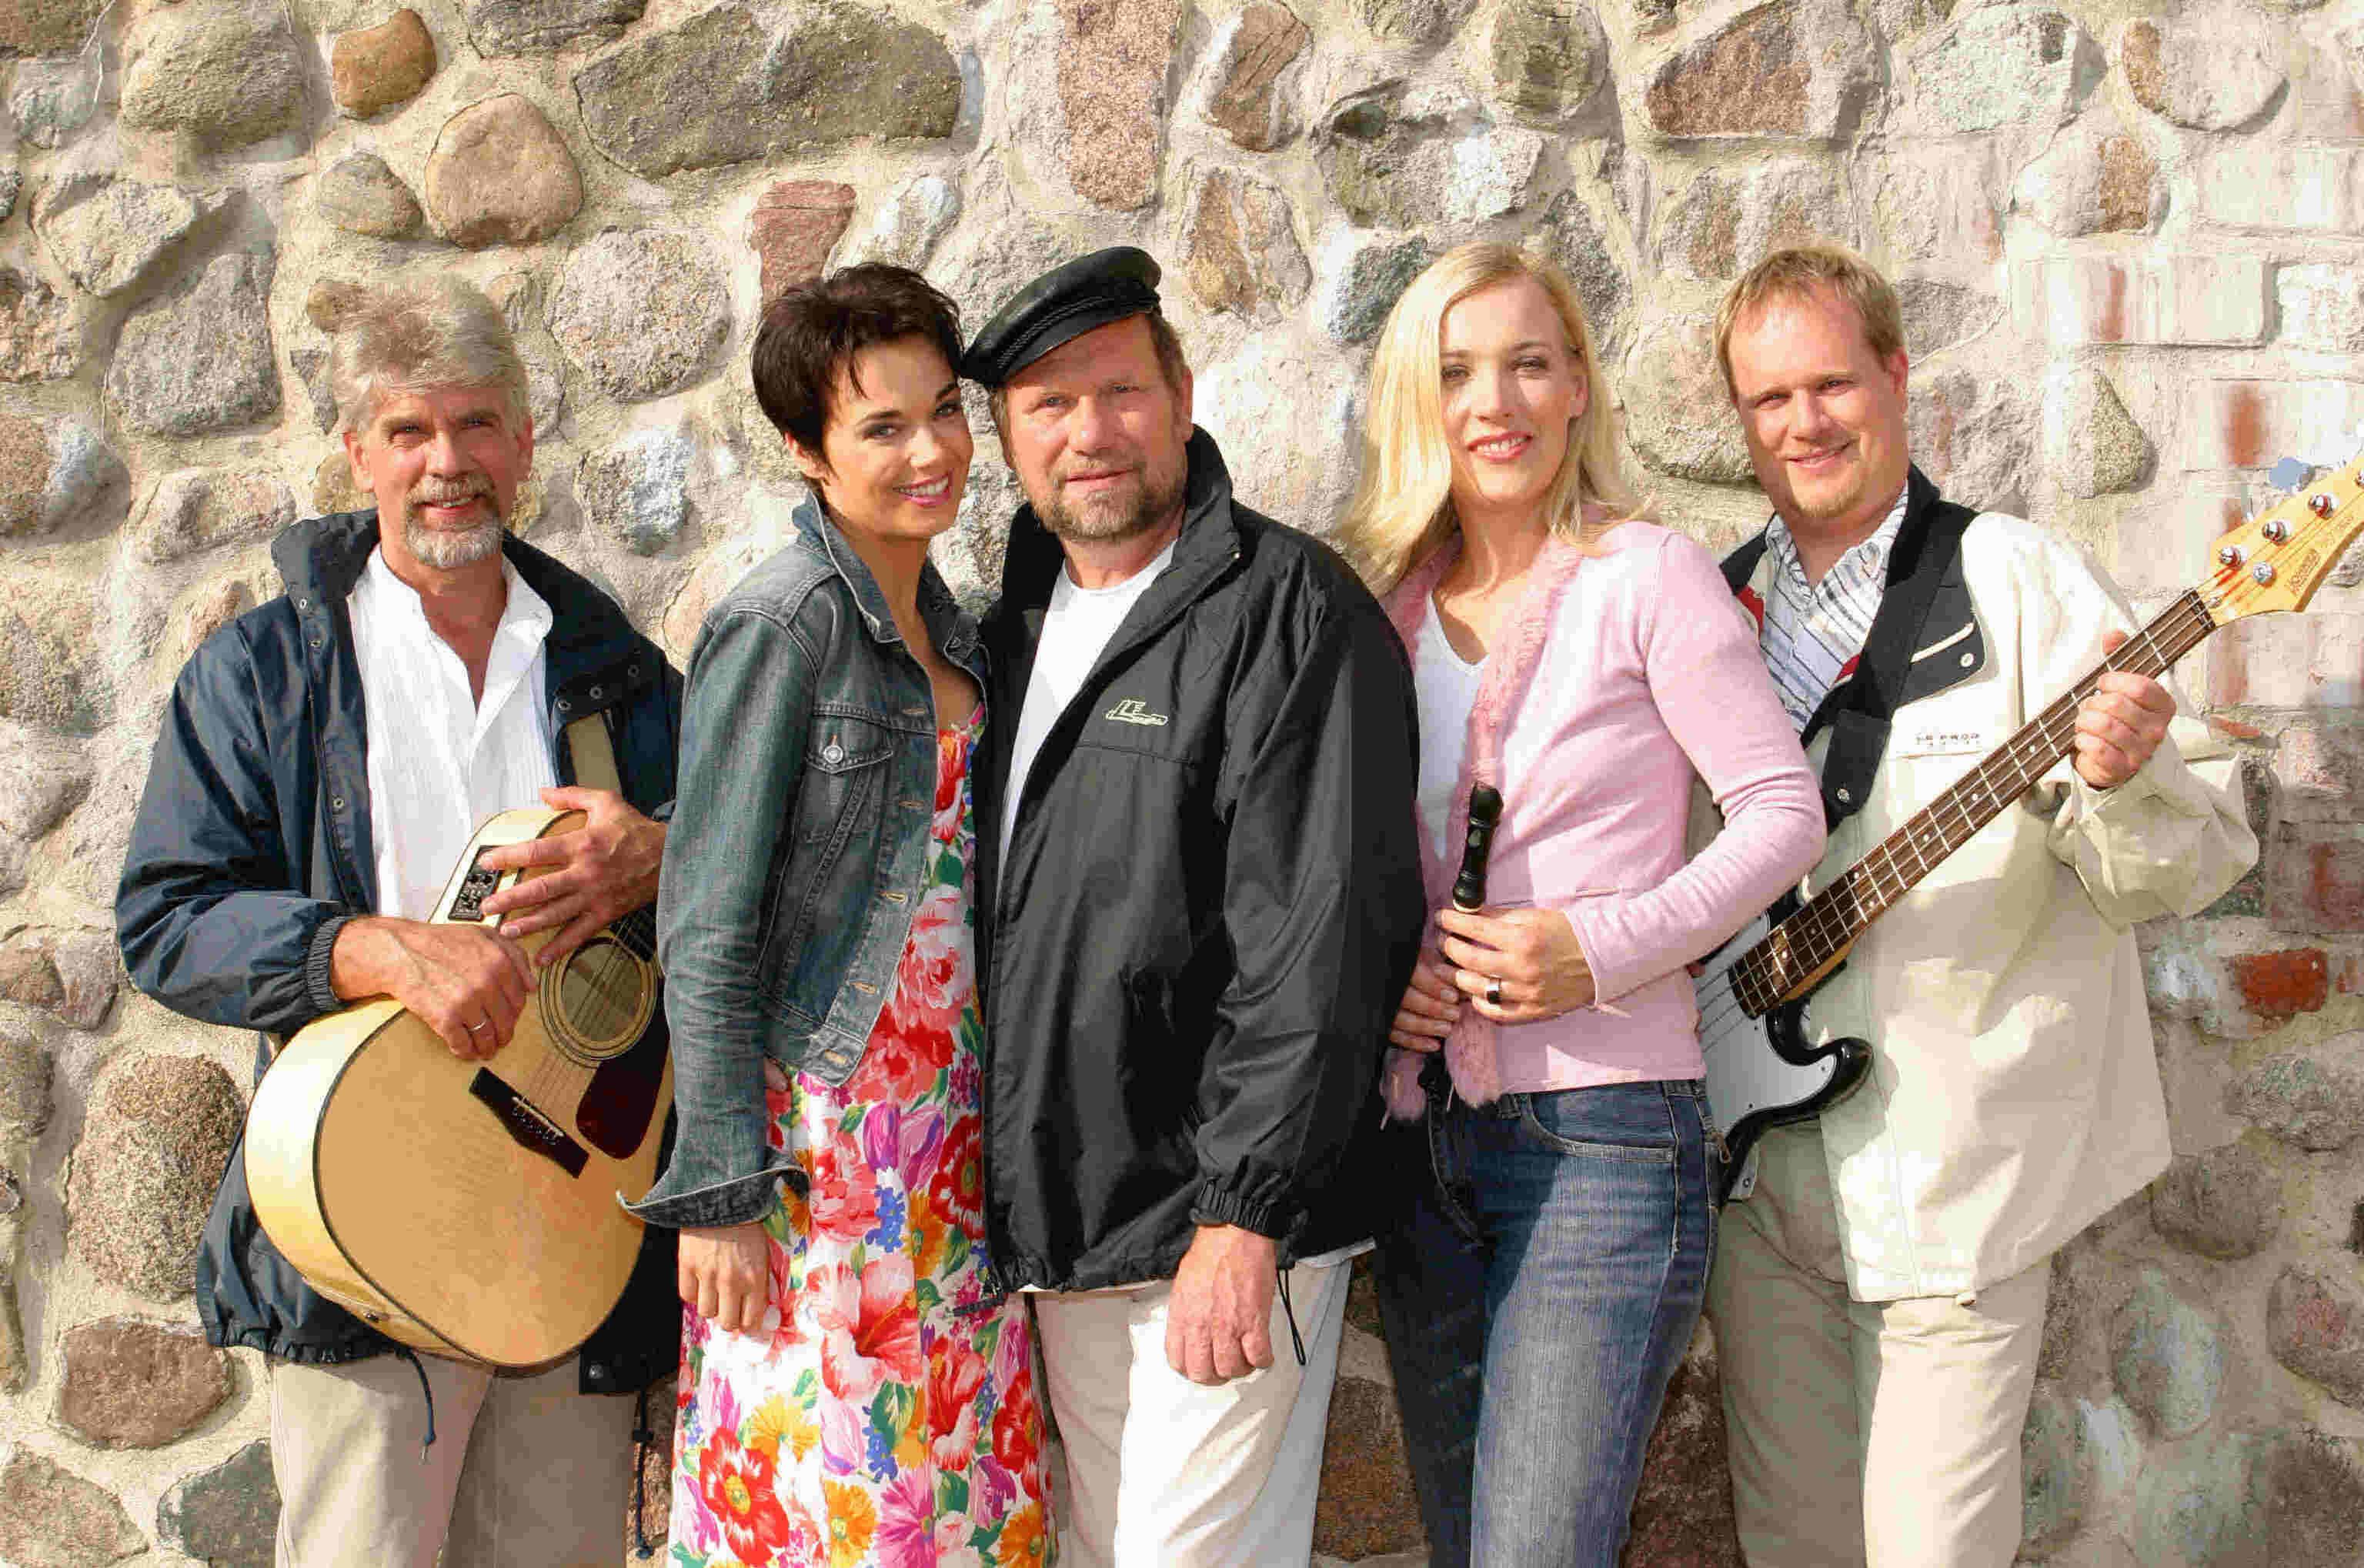 SPEELWARK - Musikalische Botschafter des Nordens